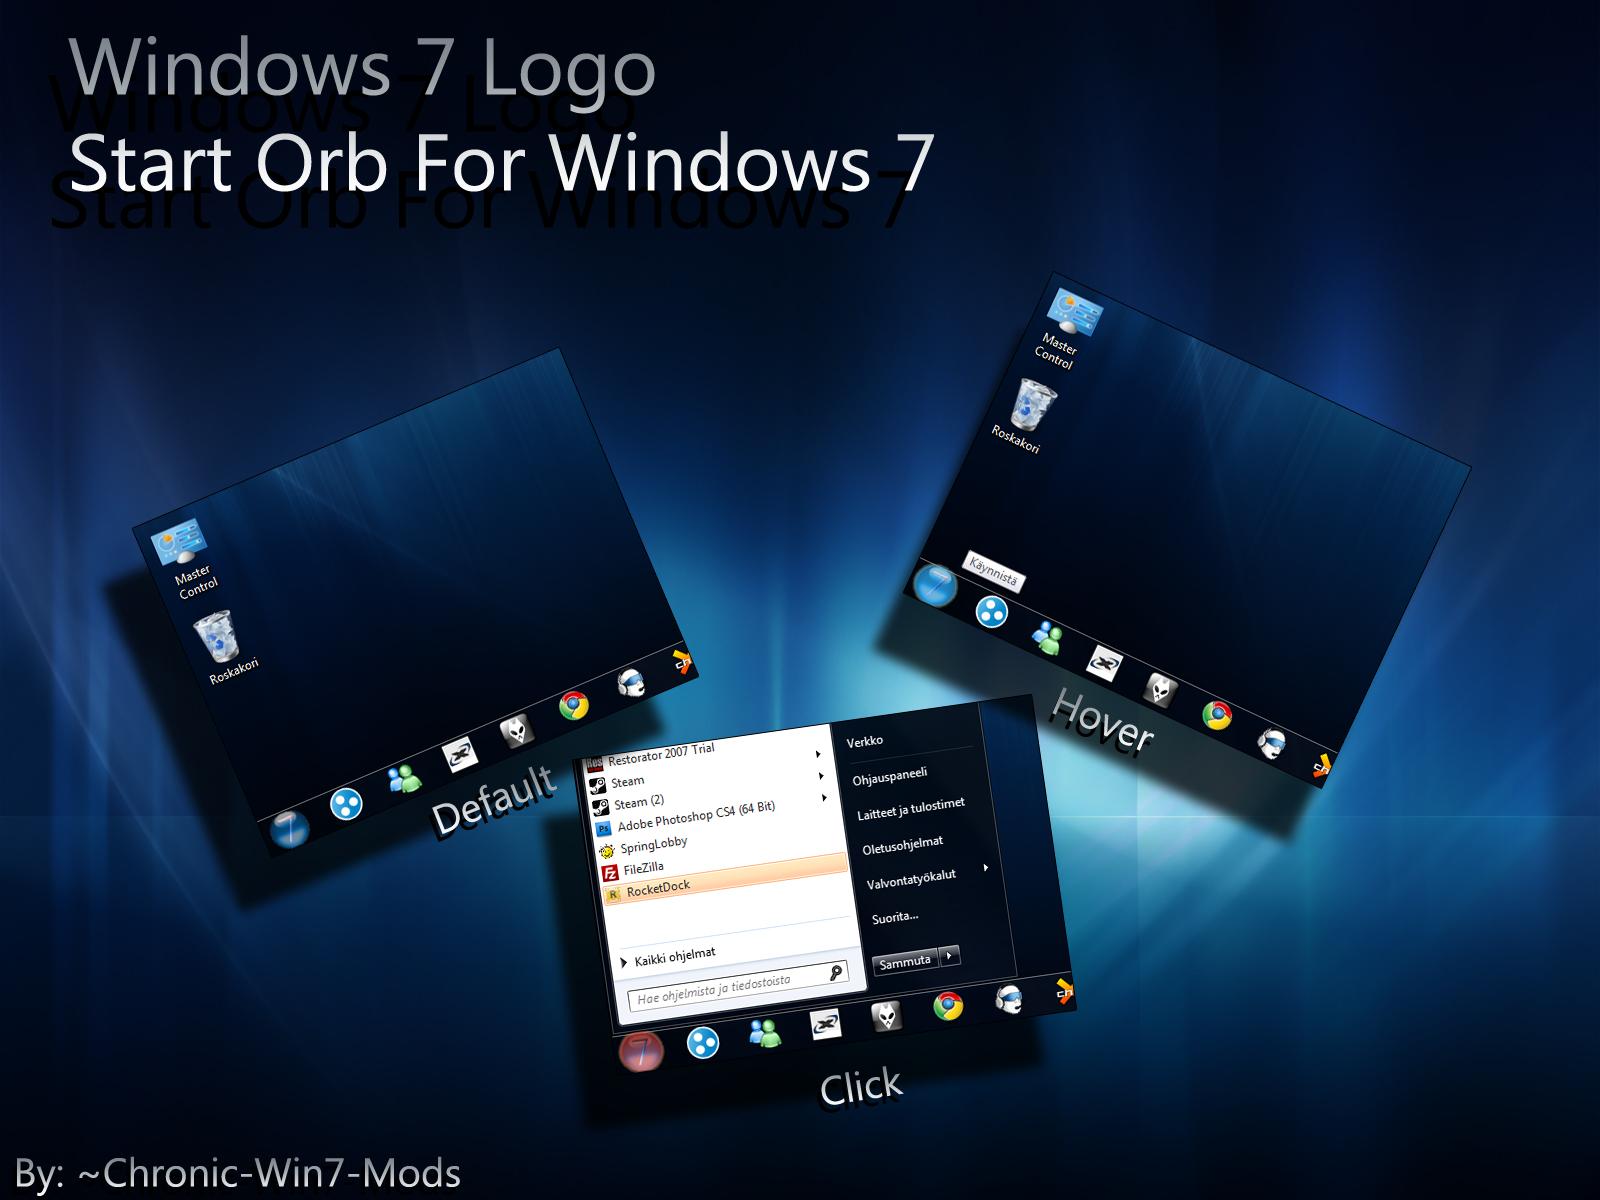 Windows 7 Logo Start Orb by Chronic-Win7-Mods